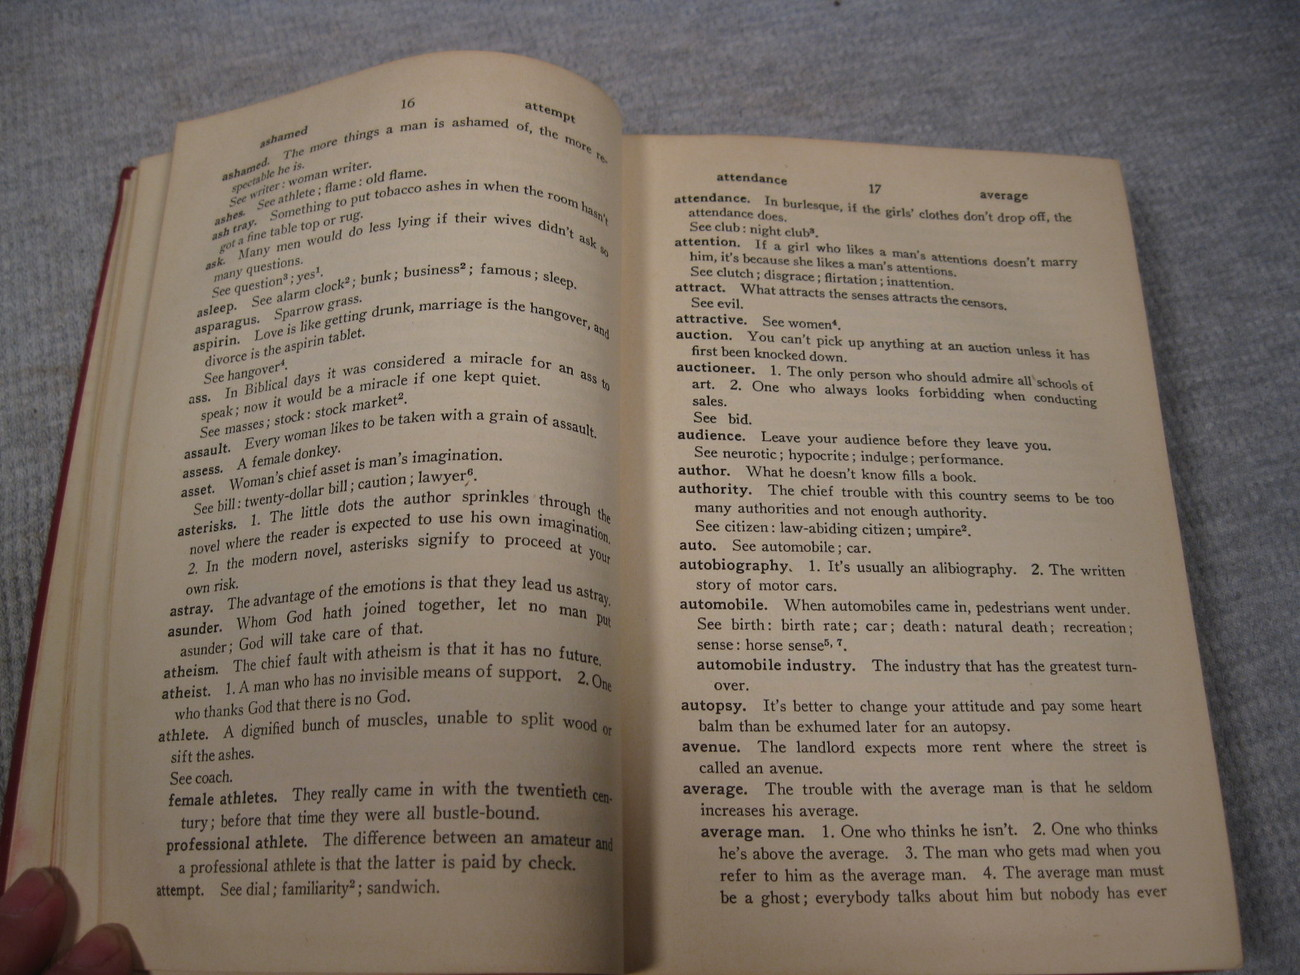 Esar's Comic Dictionary by Evan Esar HC 1st Edition, 1943